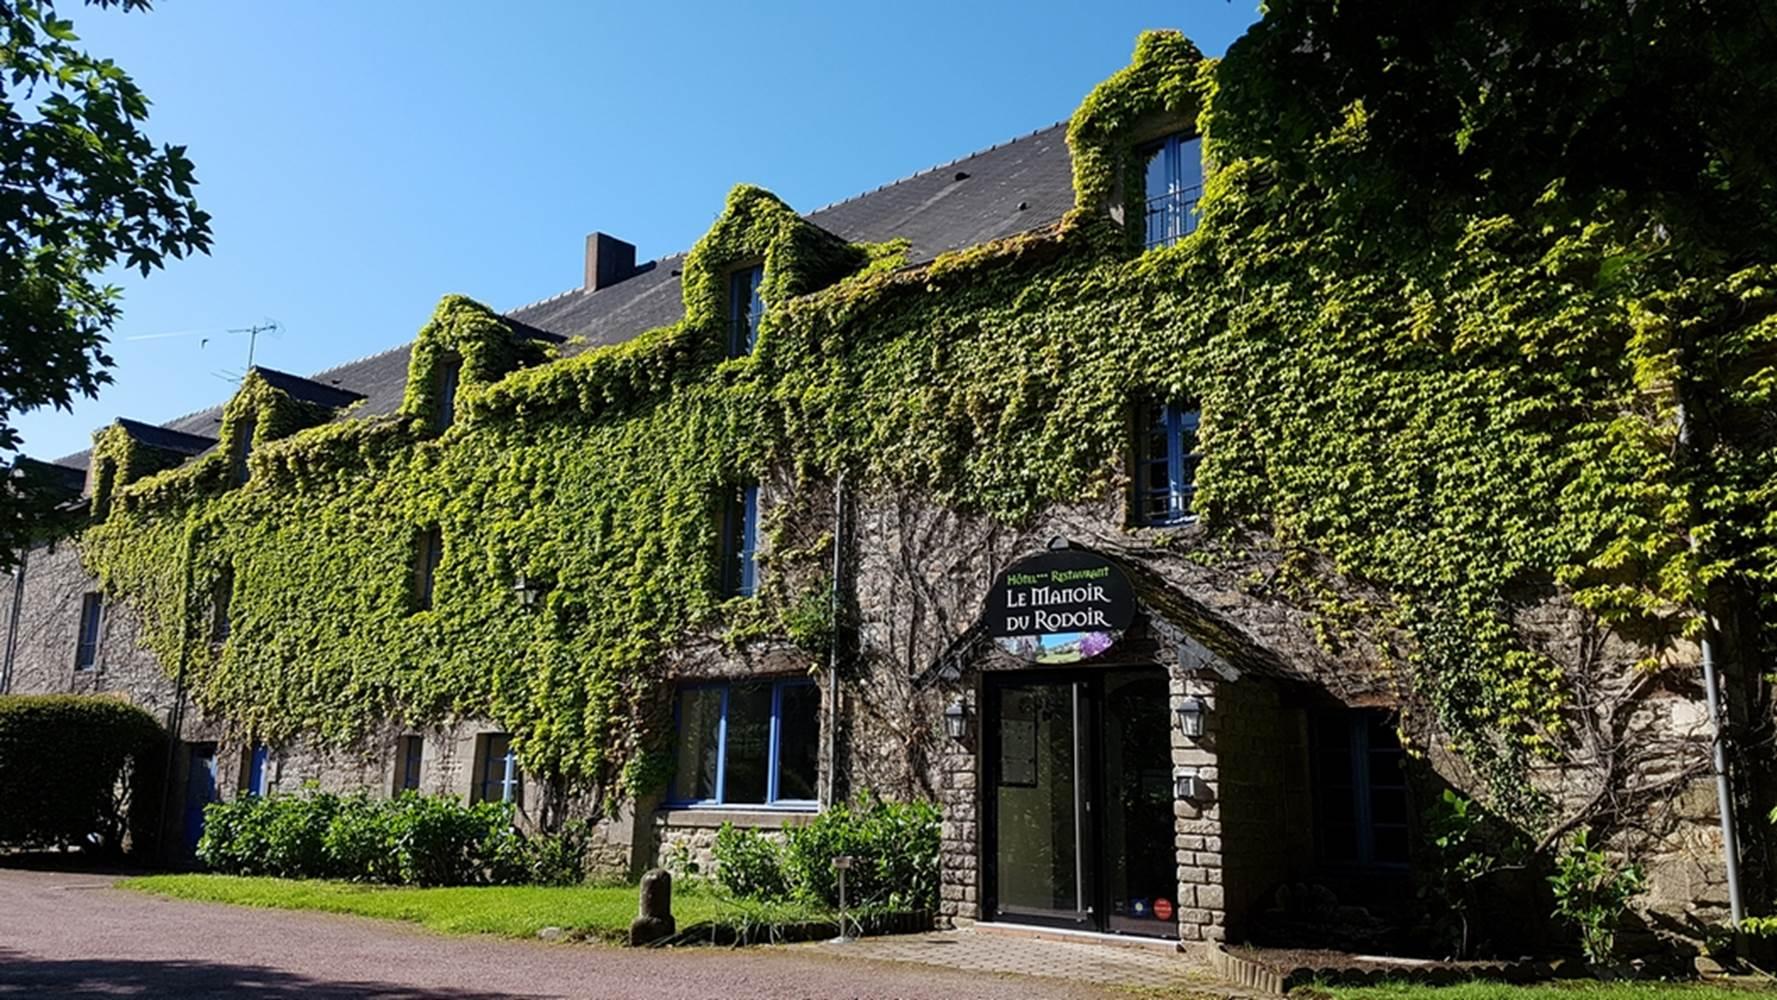 Hotel - Manoir du Rodoir - Nivillac - Tourisme Arc Sud Bretagne © Manoir du Rodoir